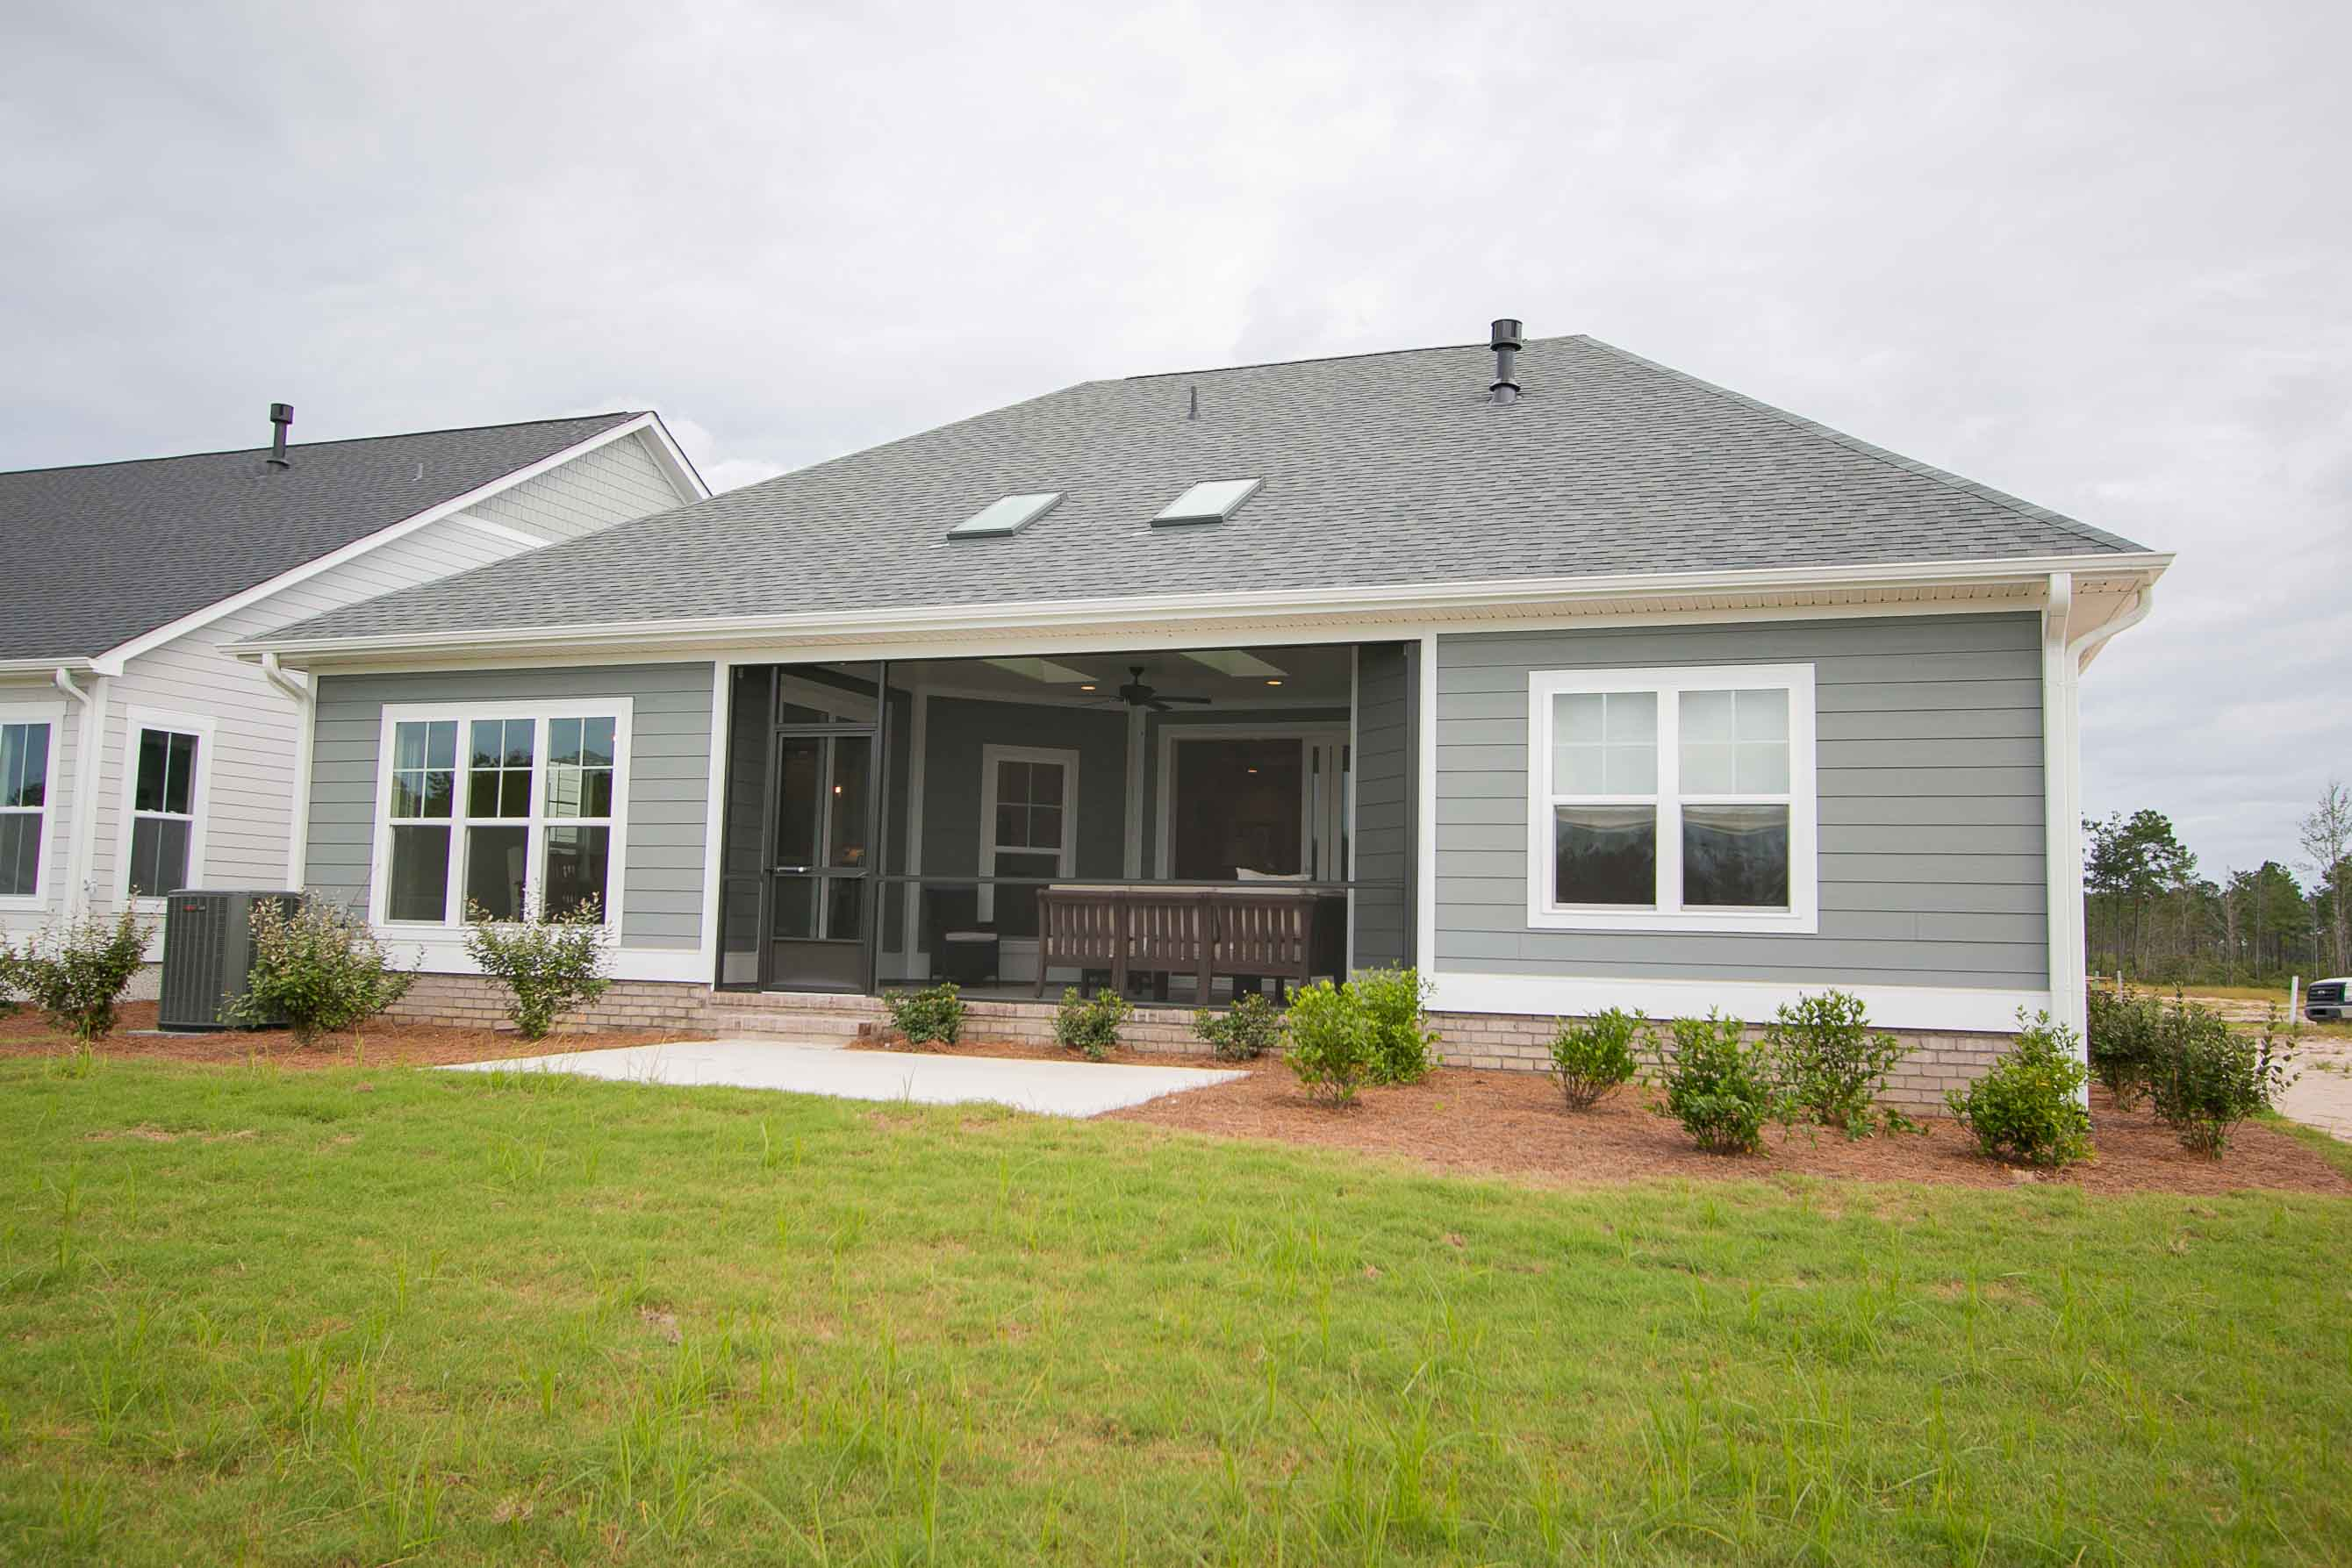 Trusst builder group new home